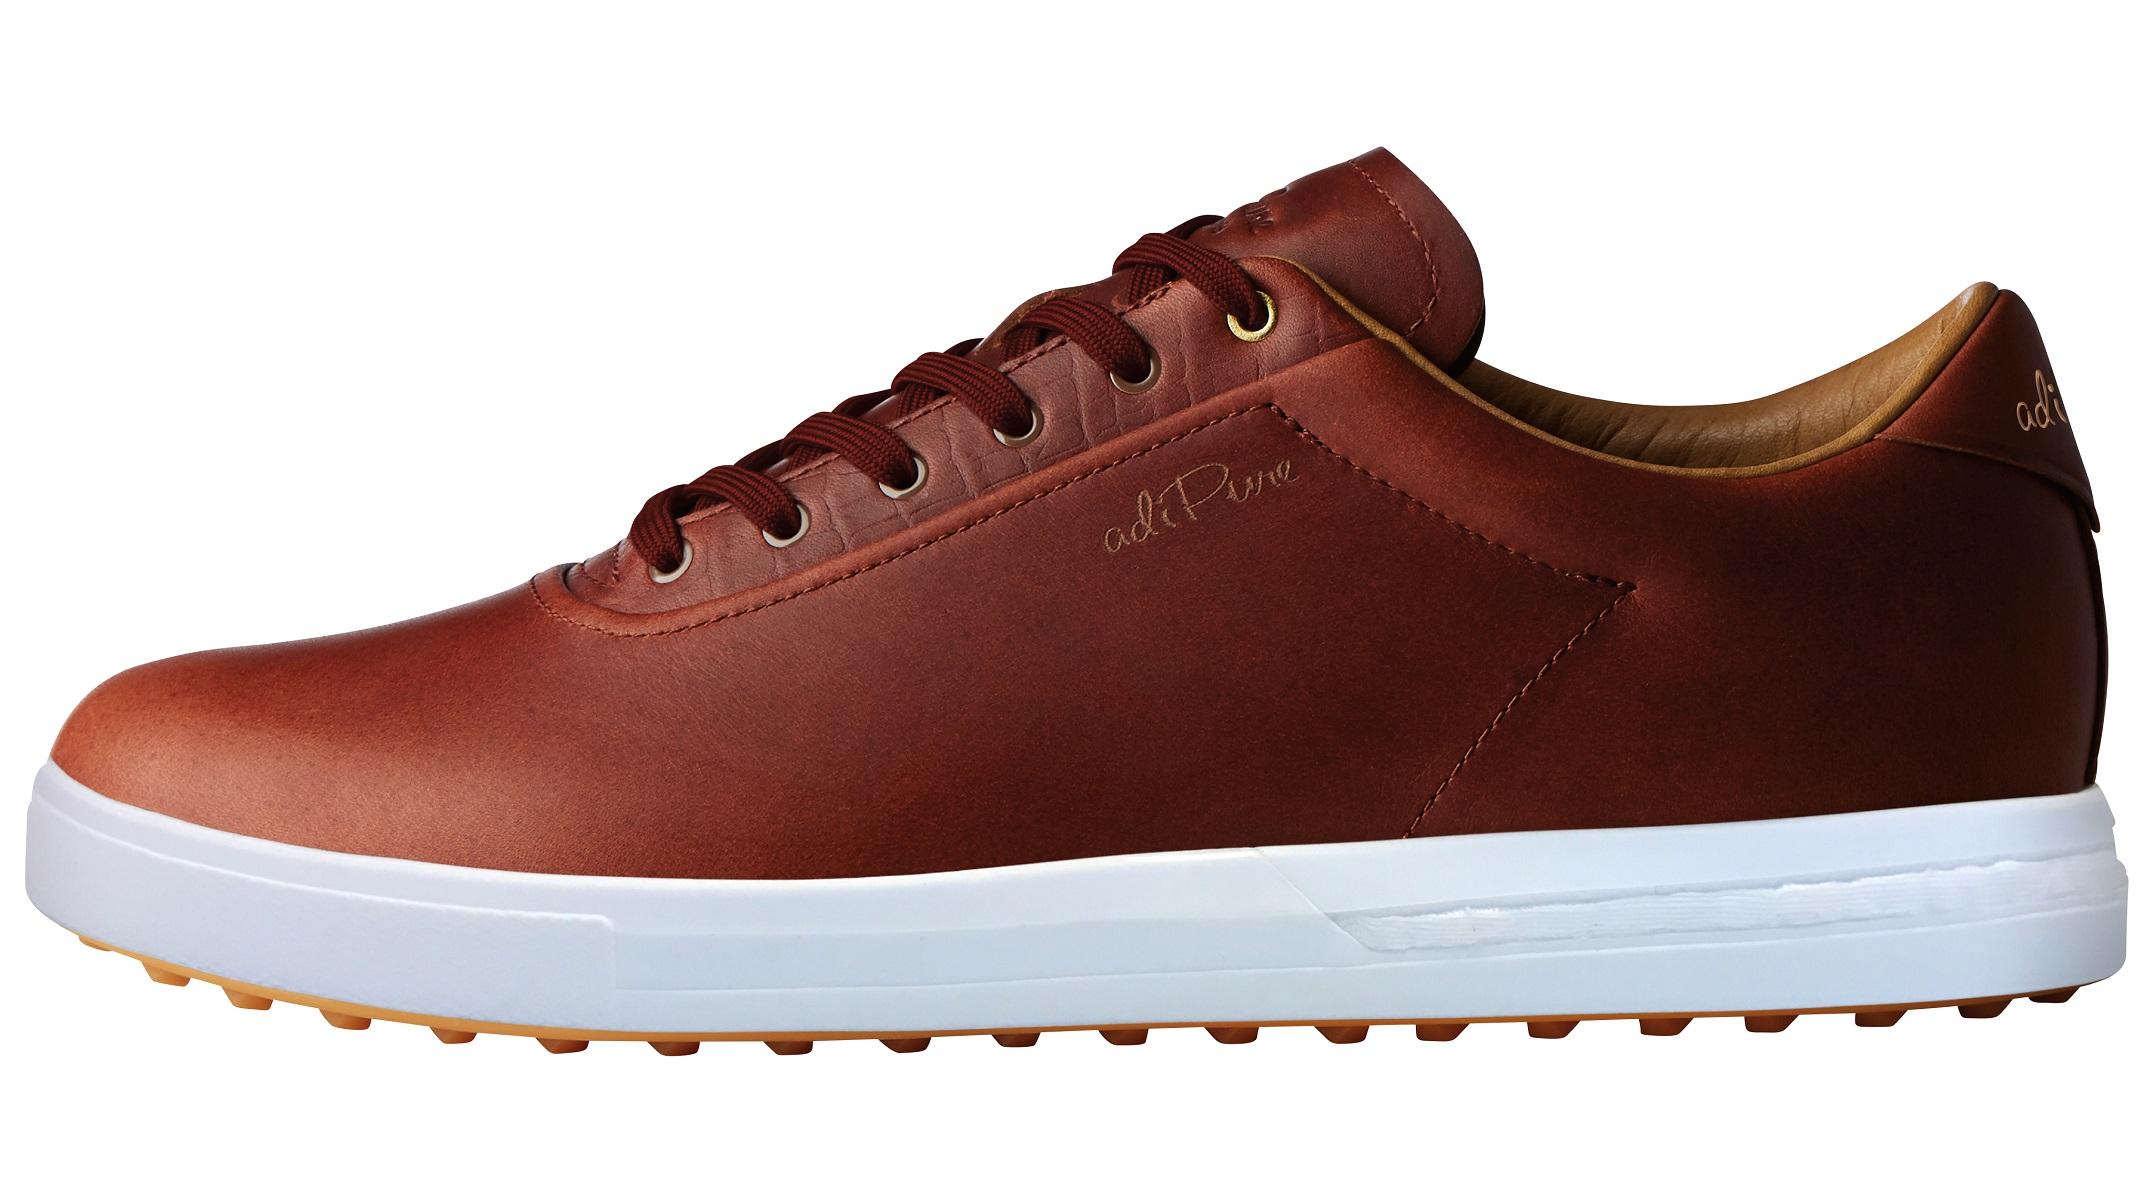 c521697b85d Adidas Adipure SP Shoes